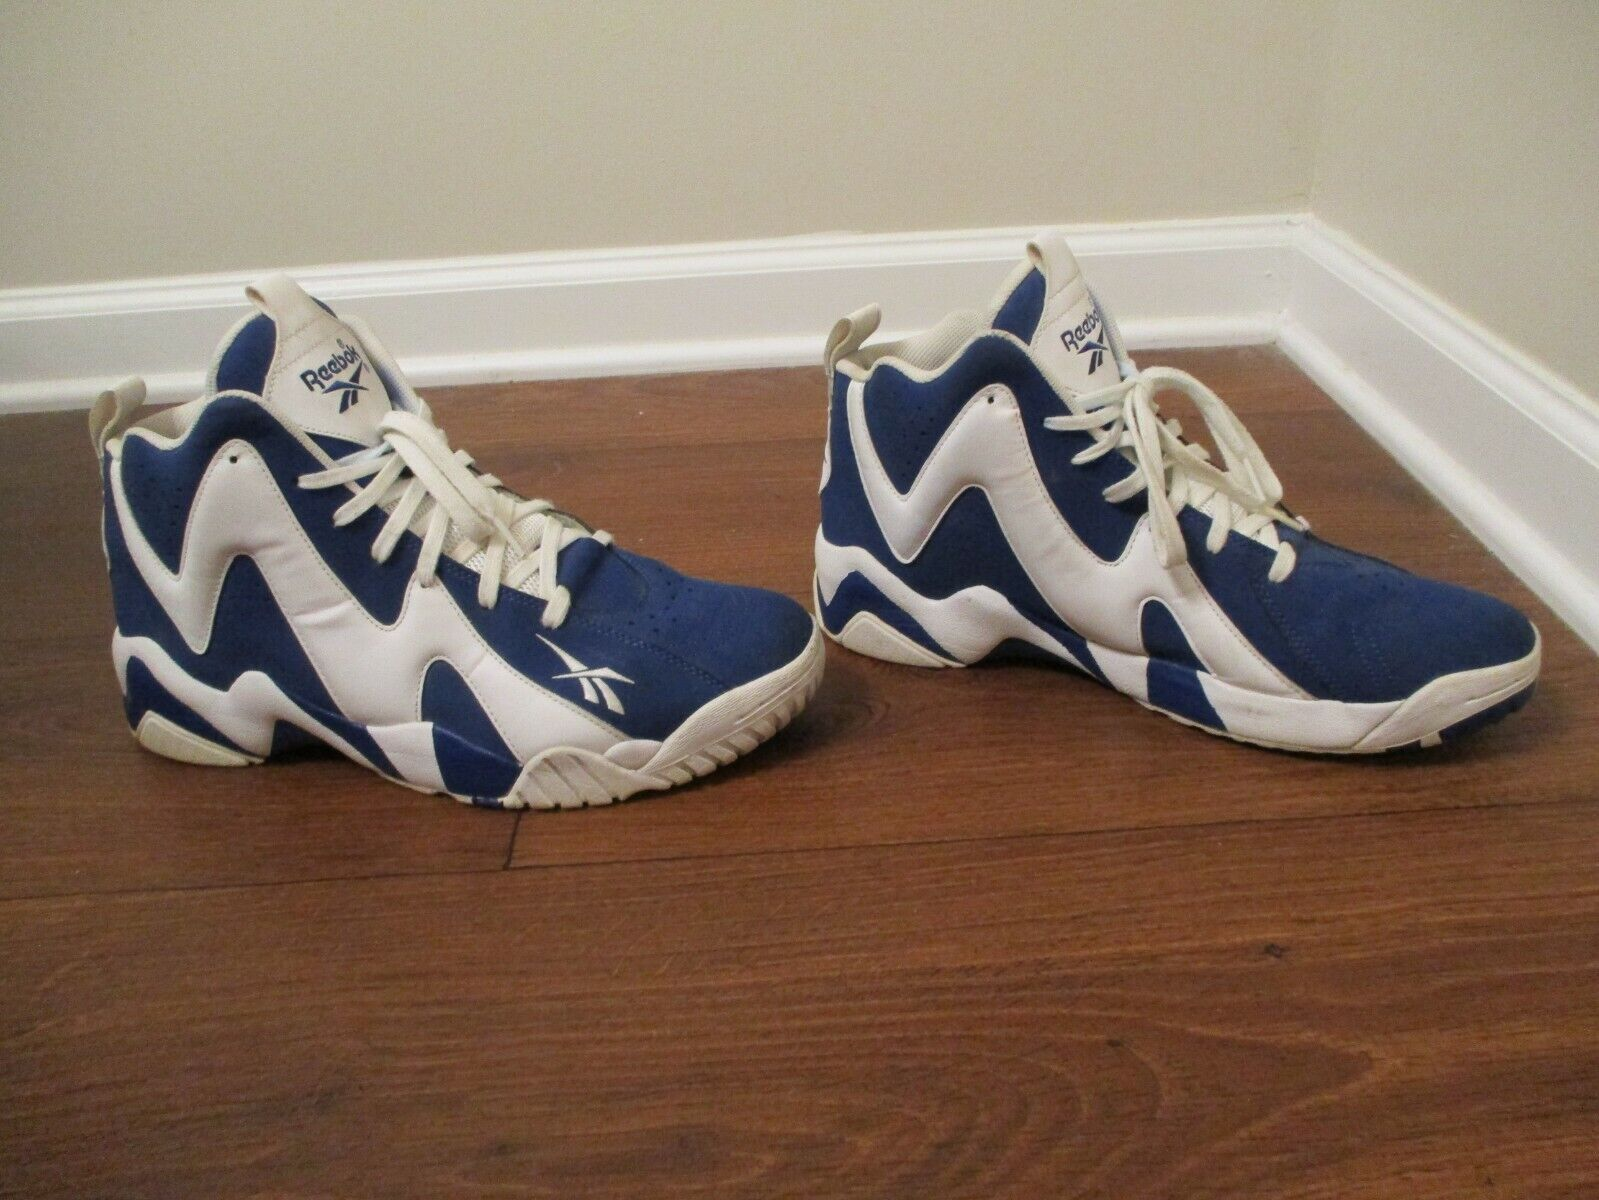 Usado Usado Reebok Kamikaze 2 carta de Intent Kemp II Zapatos Azul blancoo